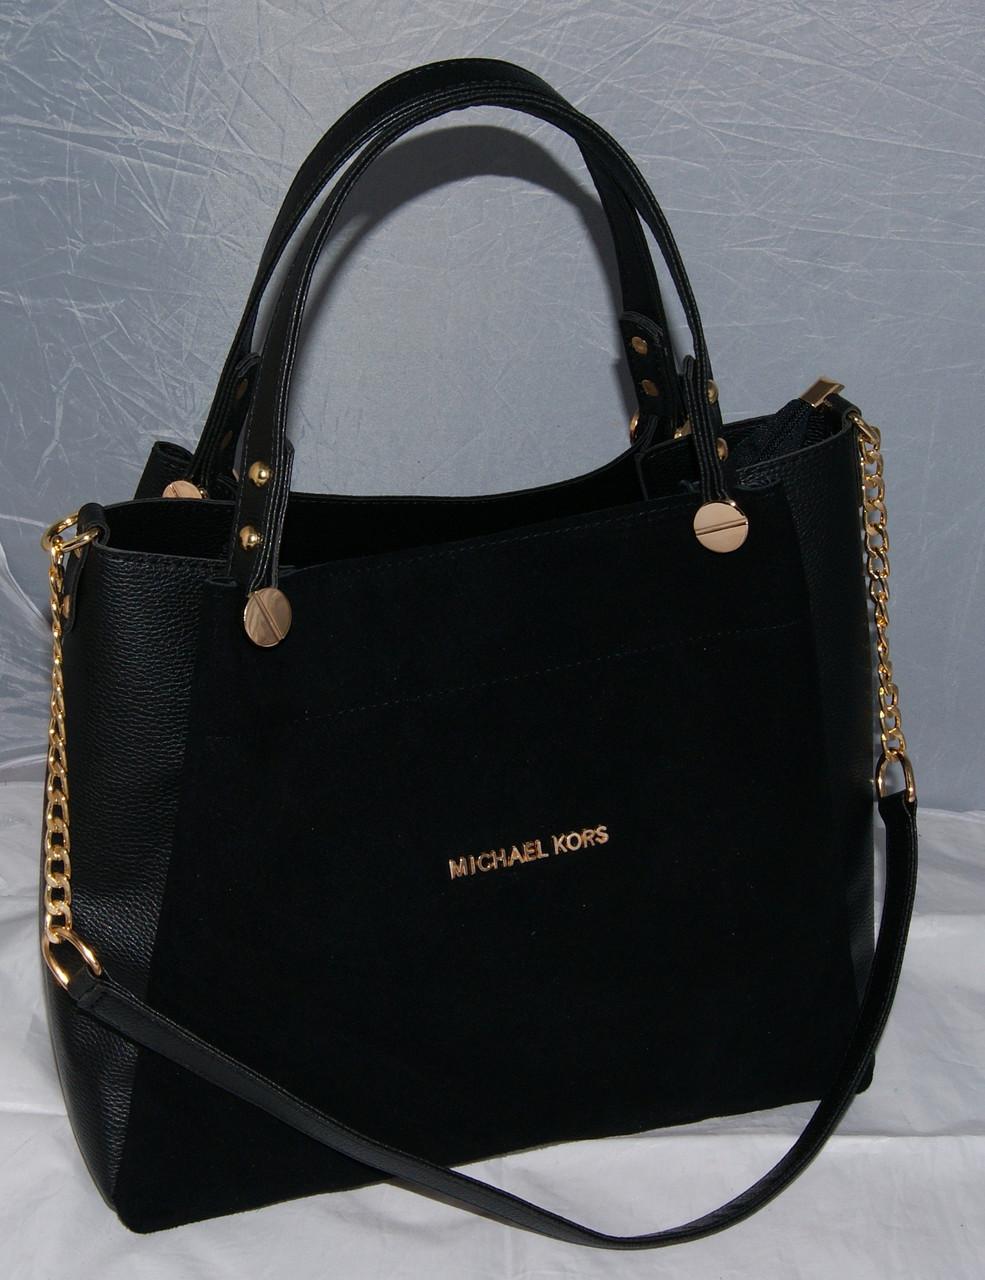 fa8ed092e5d4 Женская замшевая сумка Michael Kors, цвет черный Майкл Корс MK ...